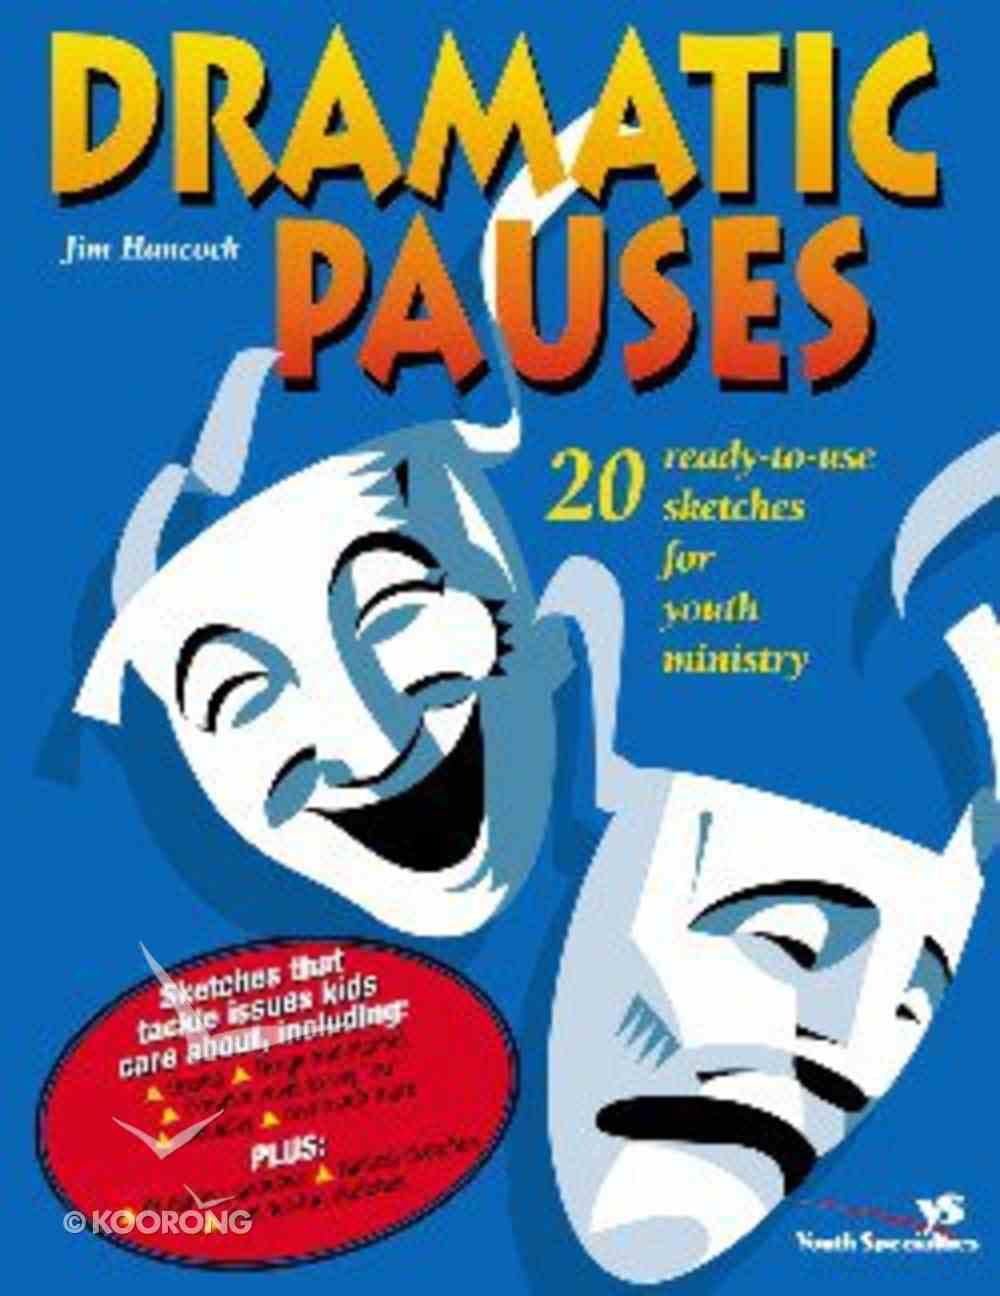 Dramatic Pauses Paperback